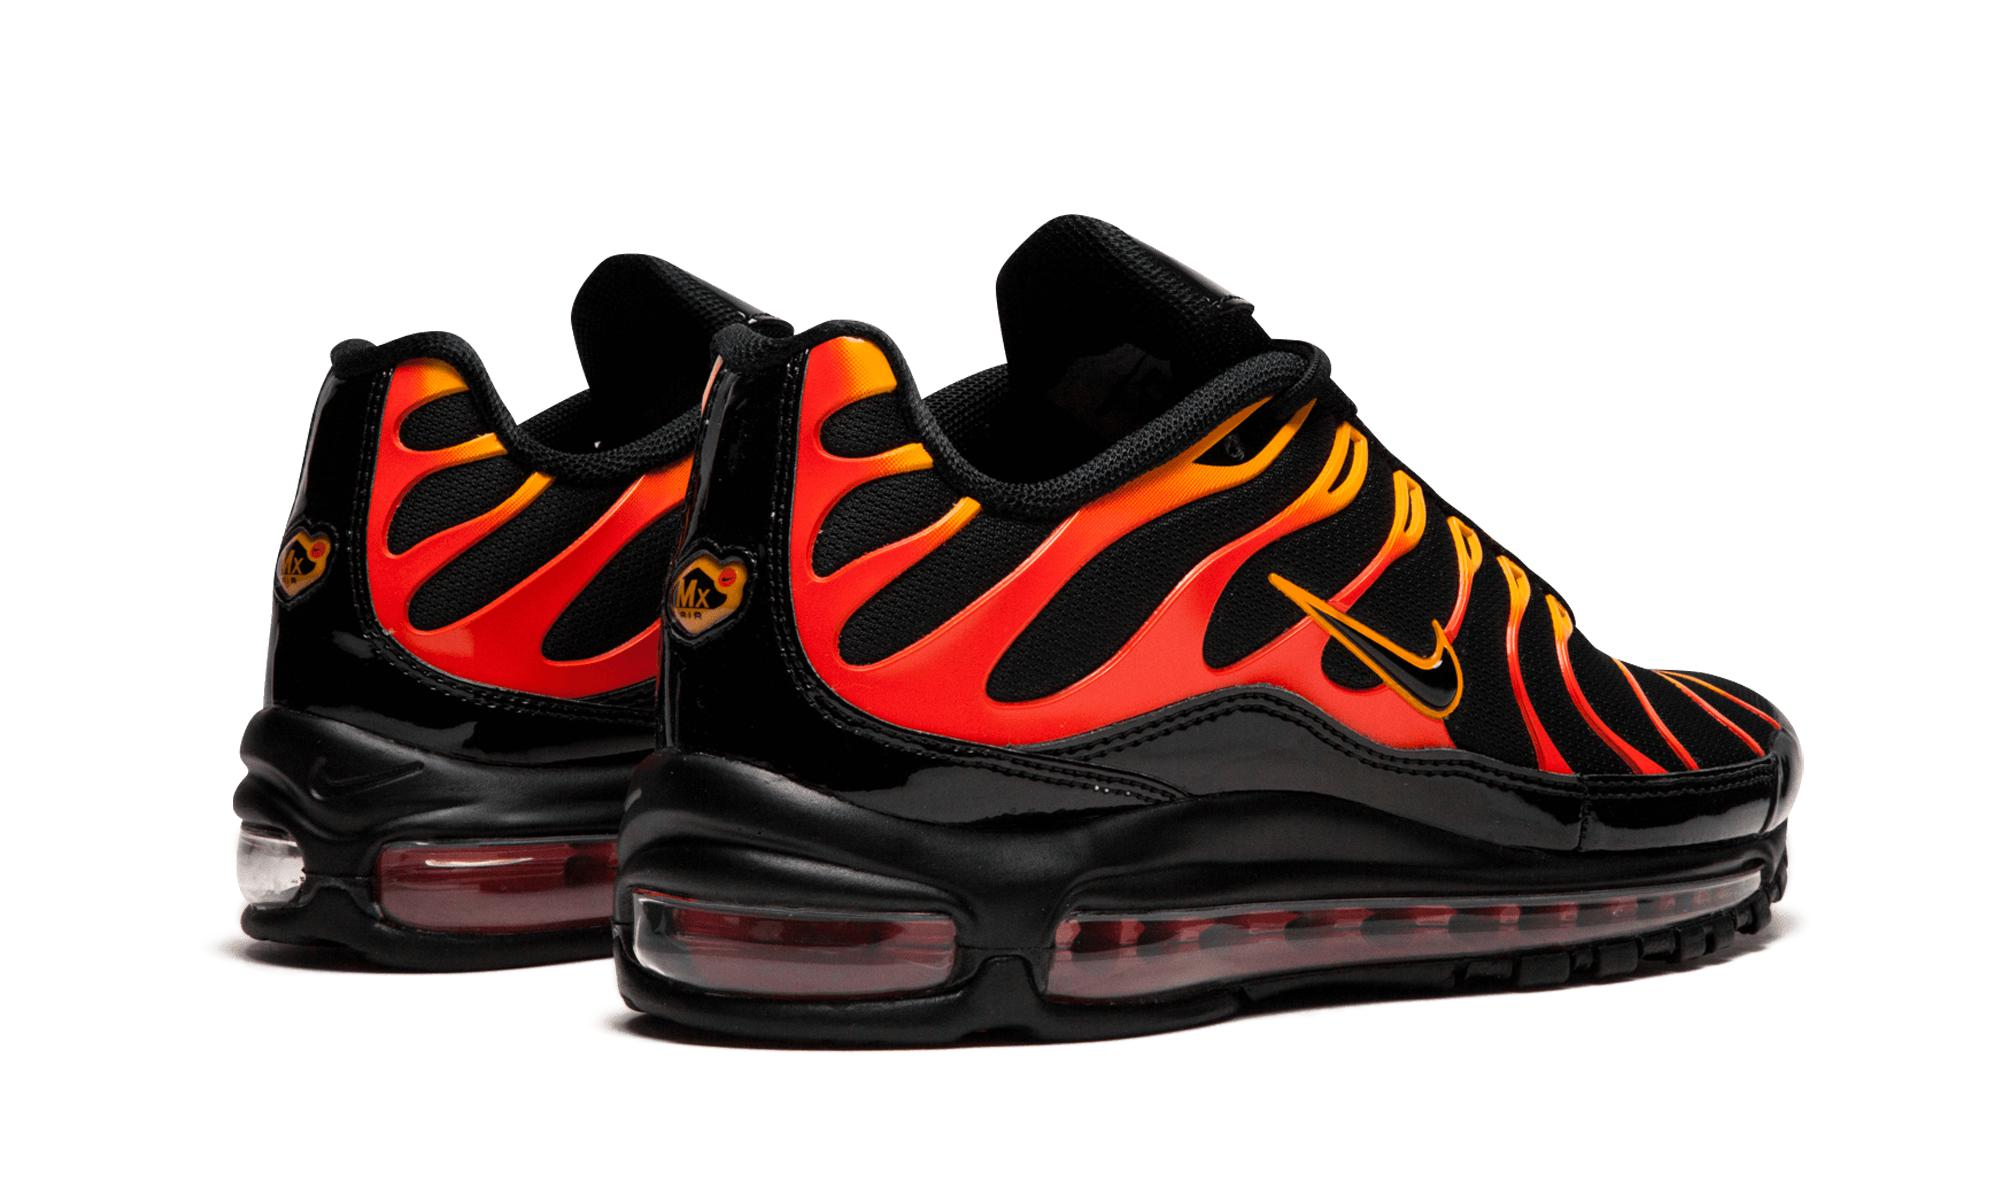 Nike Air Max 97 Plus In Black Orange Yellow Black For Men Lyst